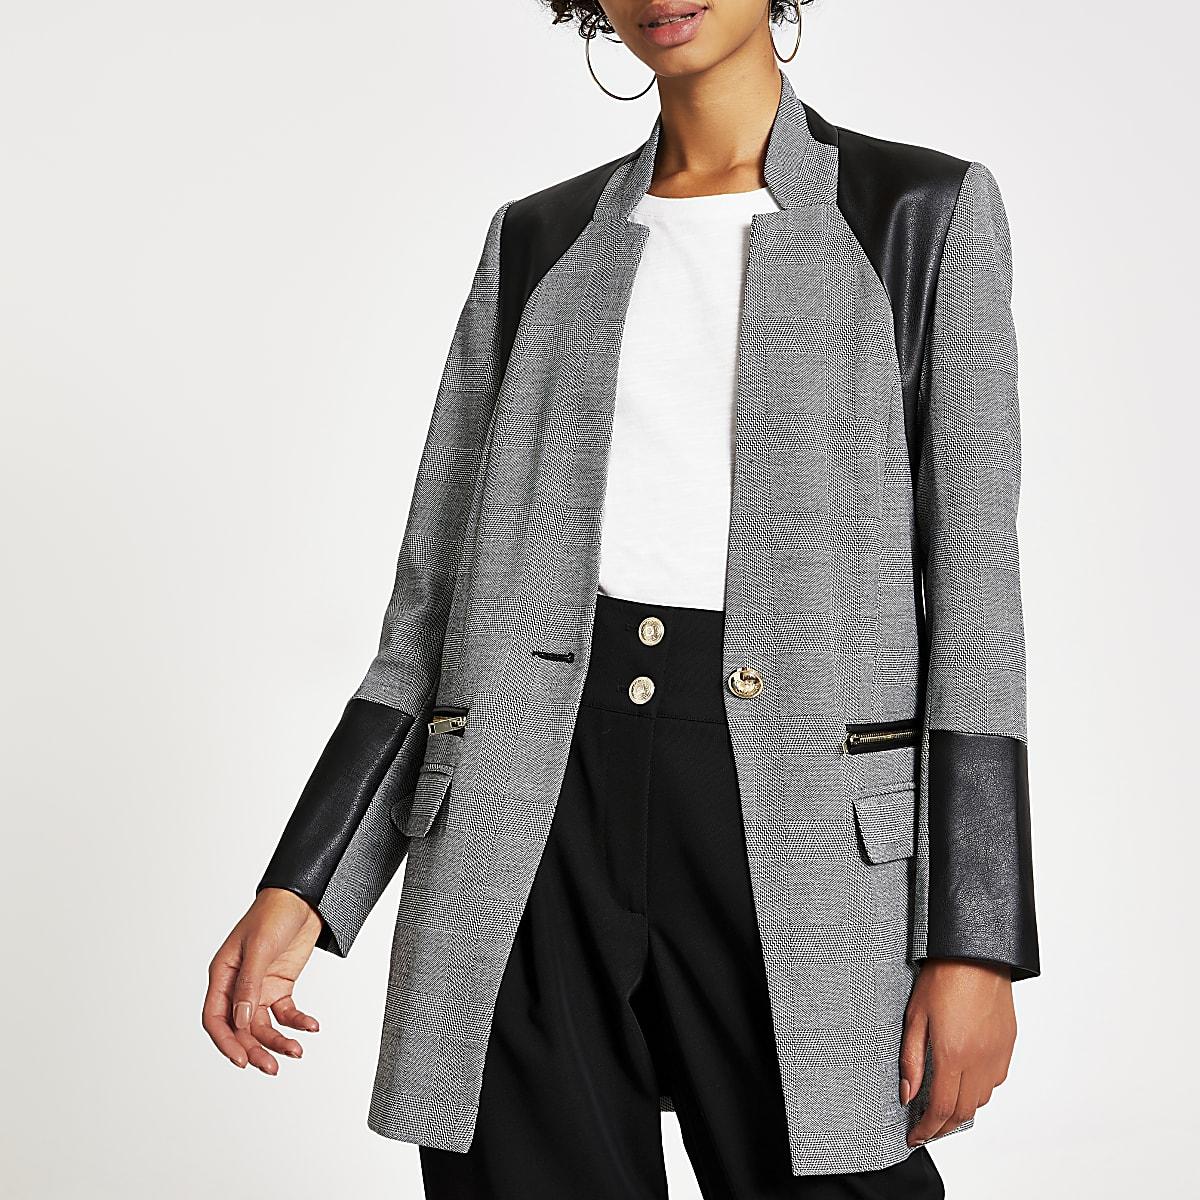 Grey herringbone faux leather blocked blazer